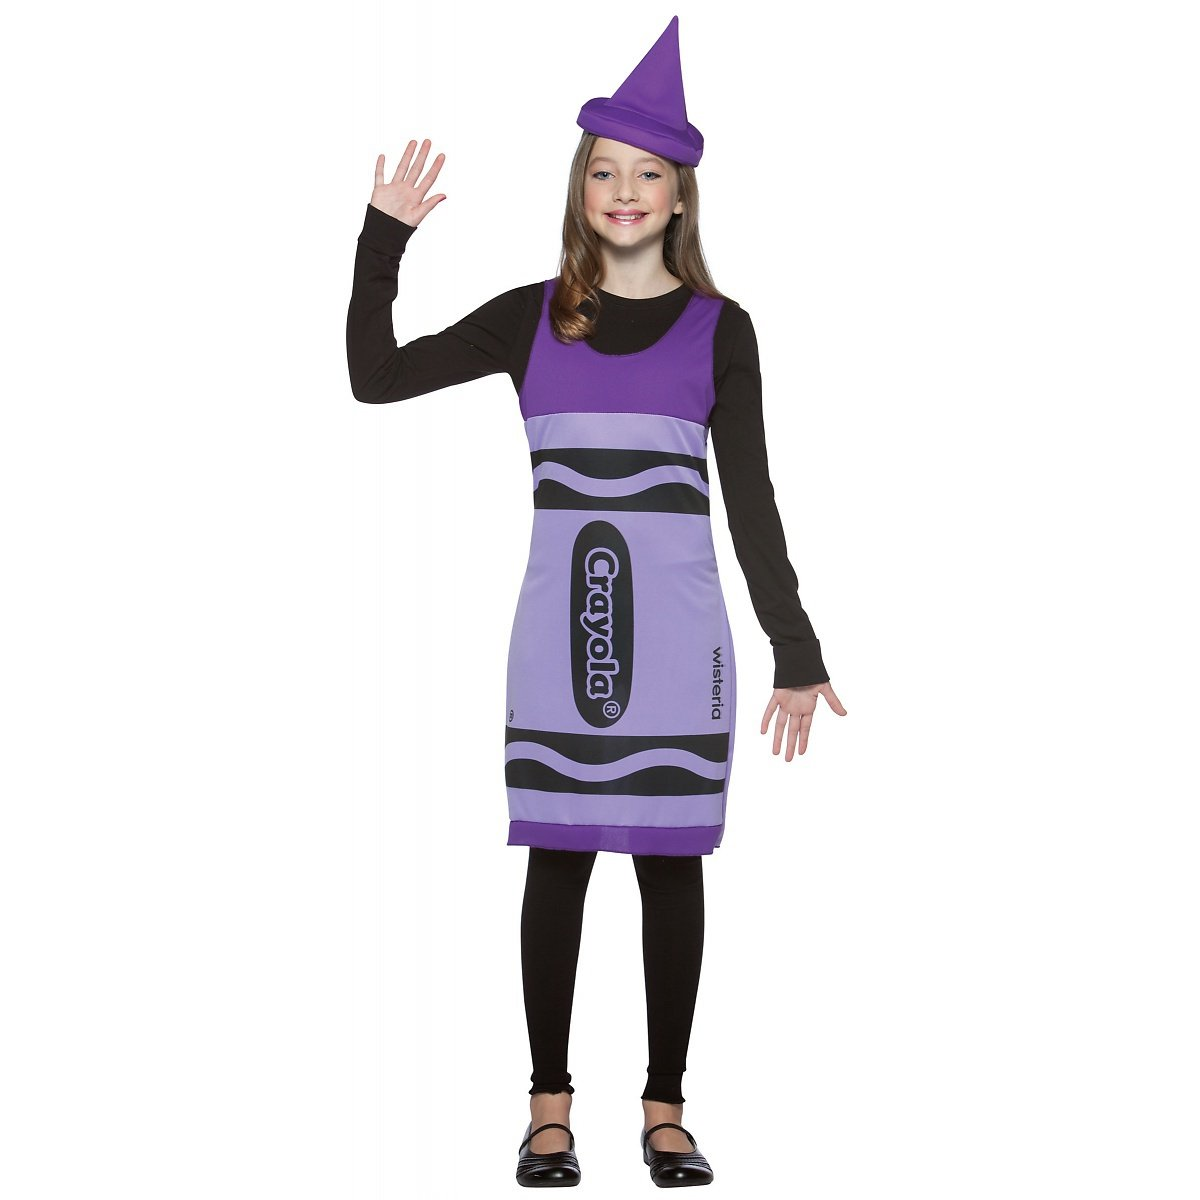 Amazon.com: Crayola Crayon Tank Dress Tween Costume Wisteria ...